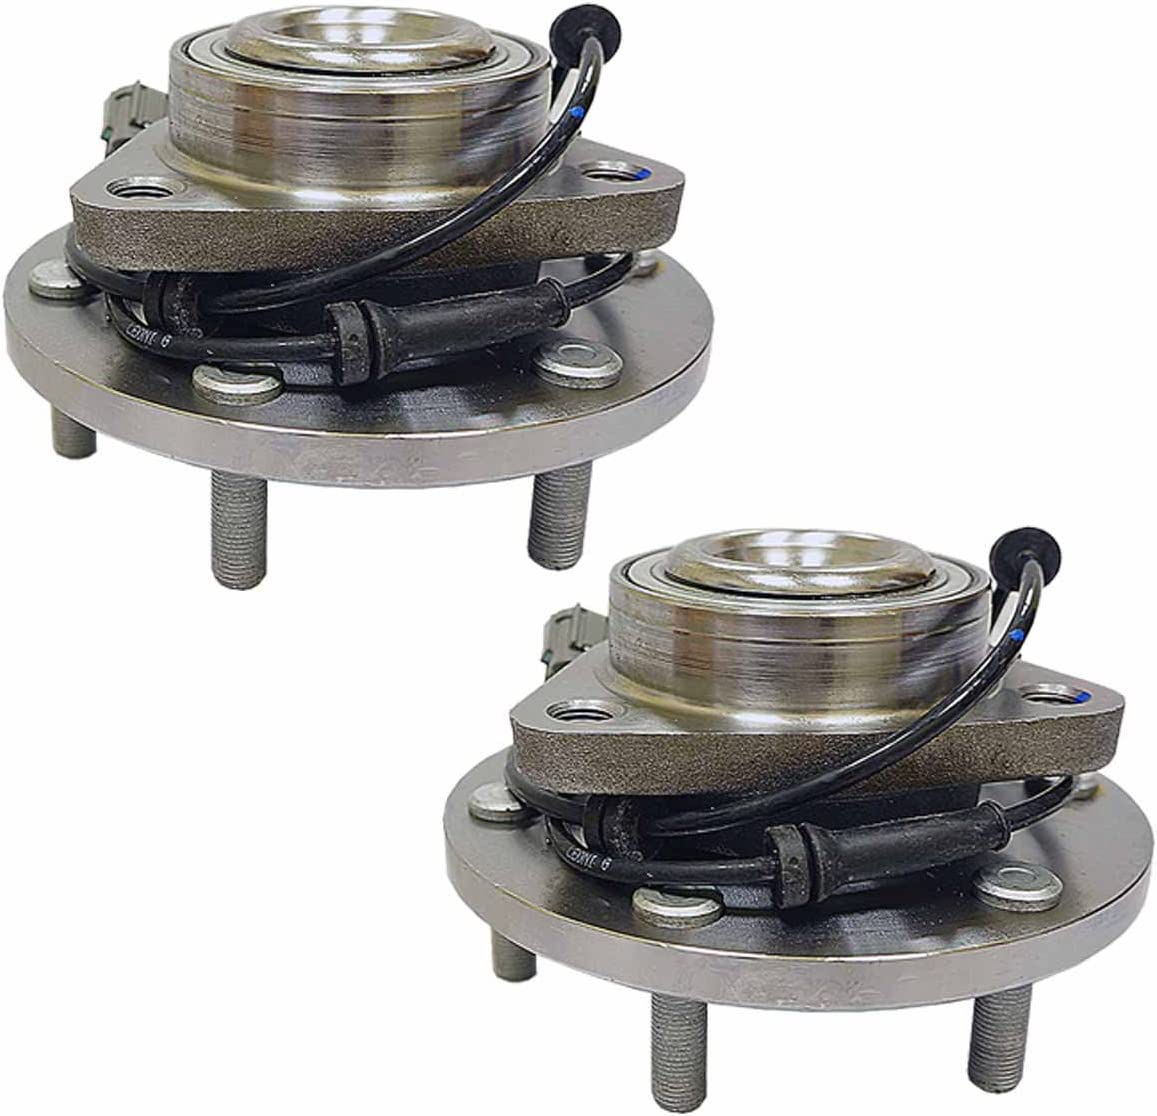 HU515066 x2 New Front Set Wheel Bearing Hub Assembly